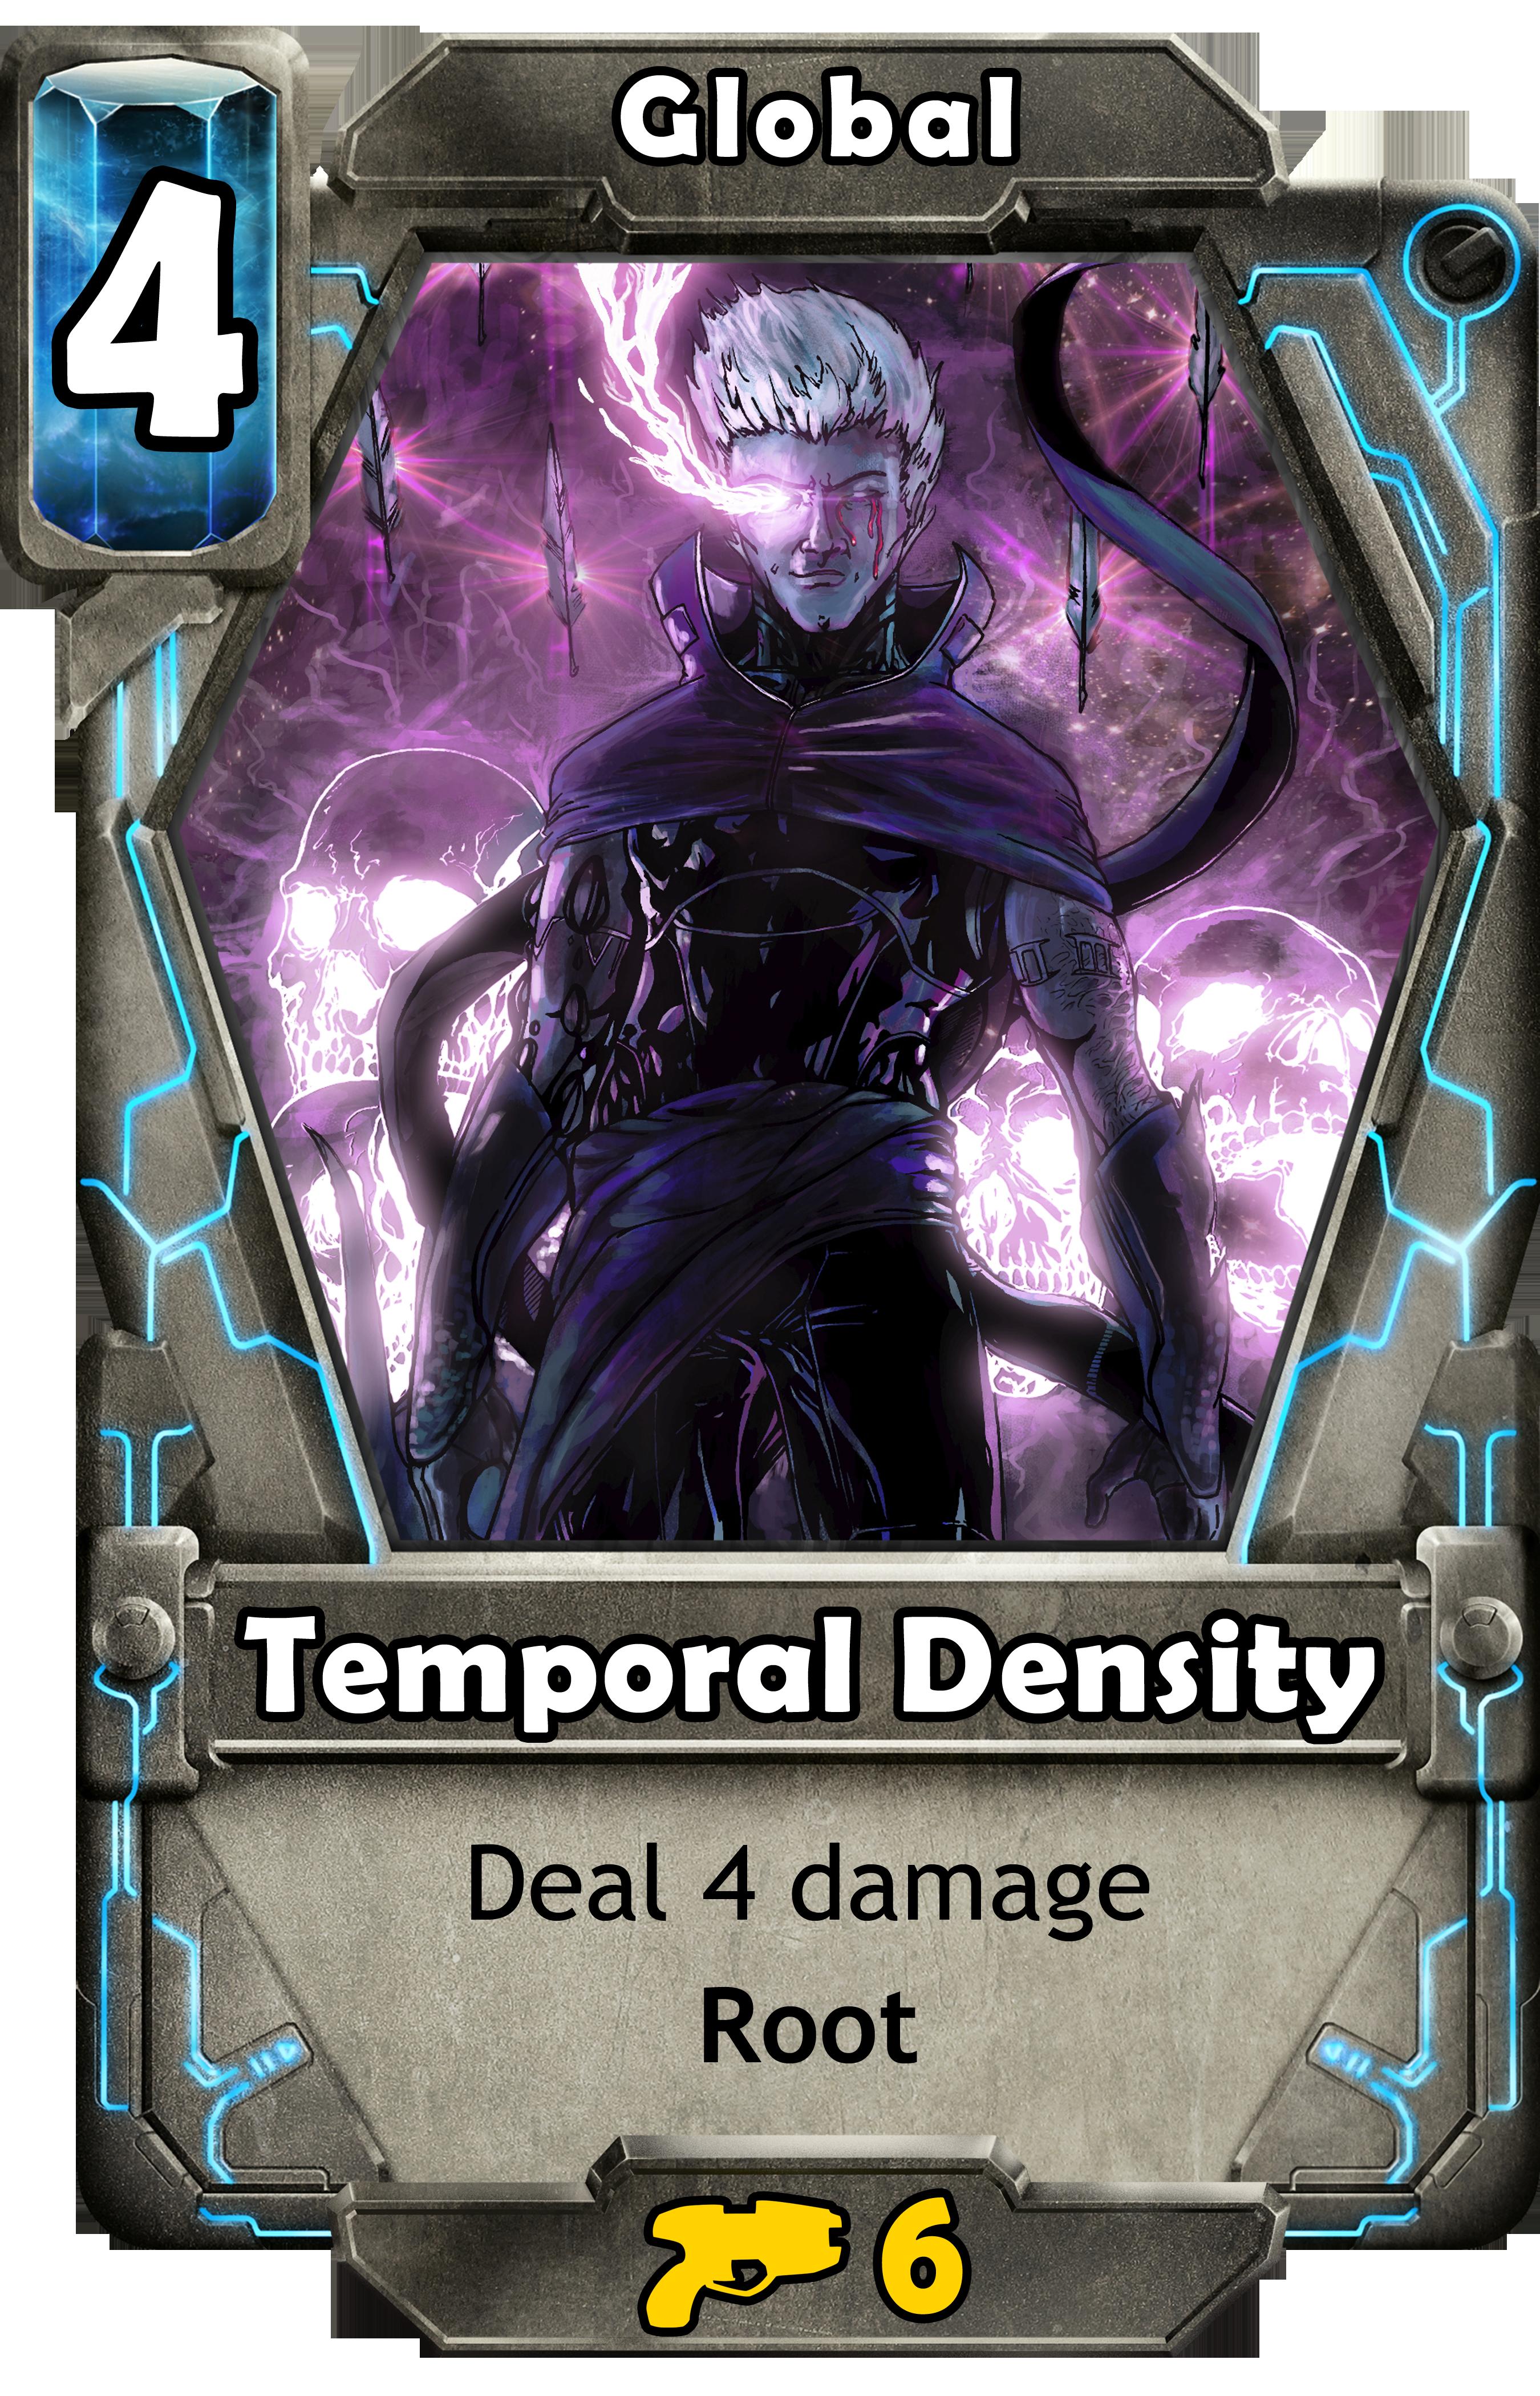 Temporal Density